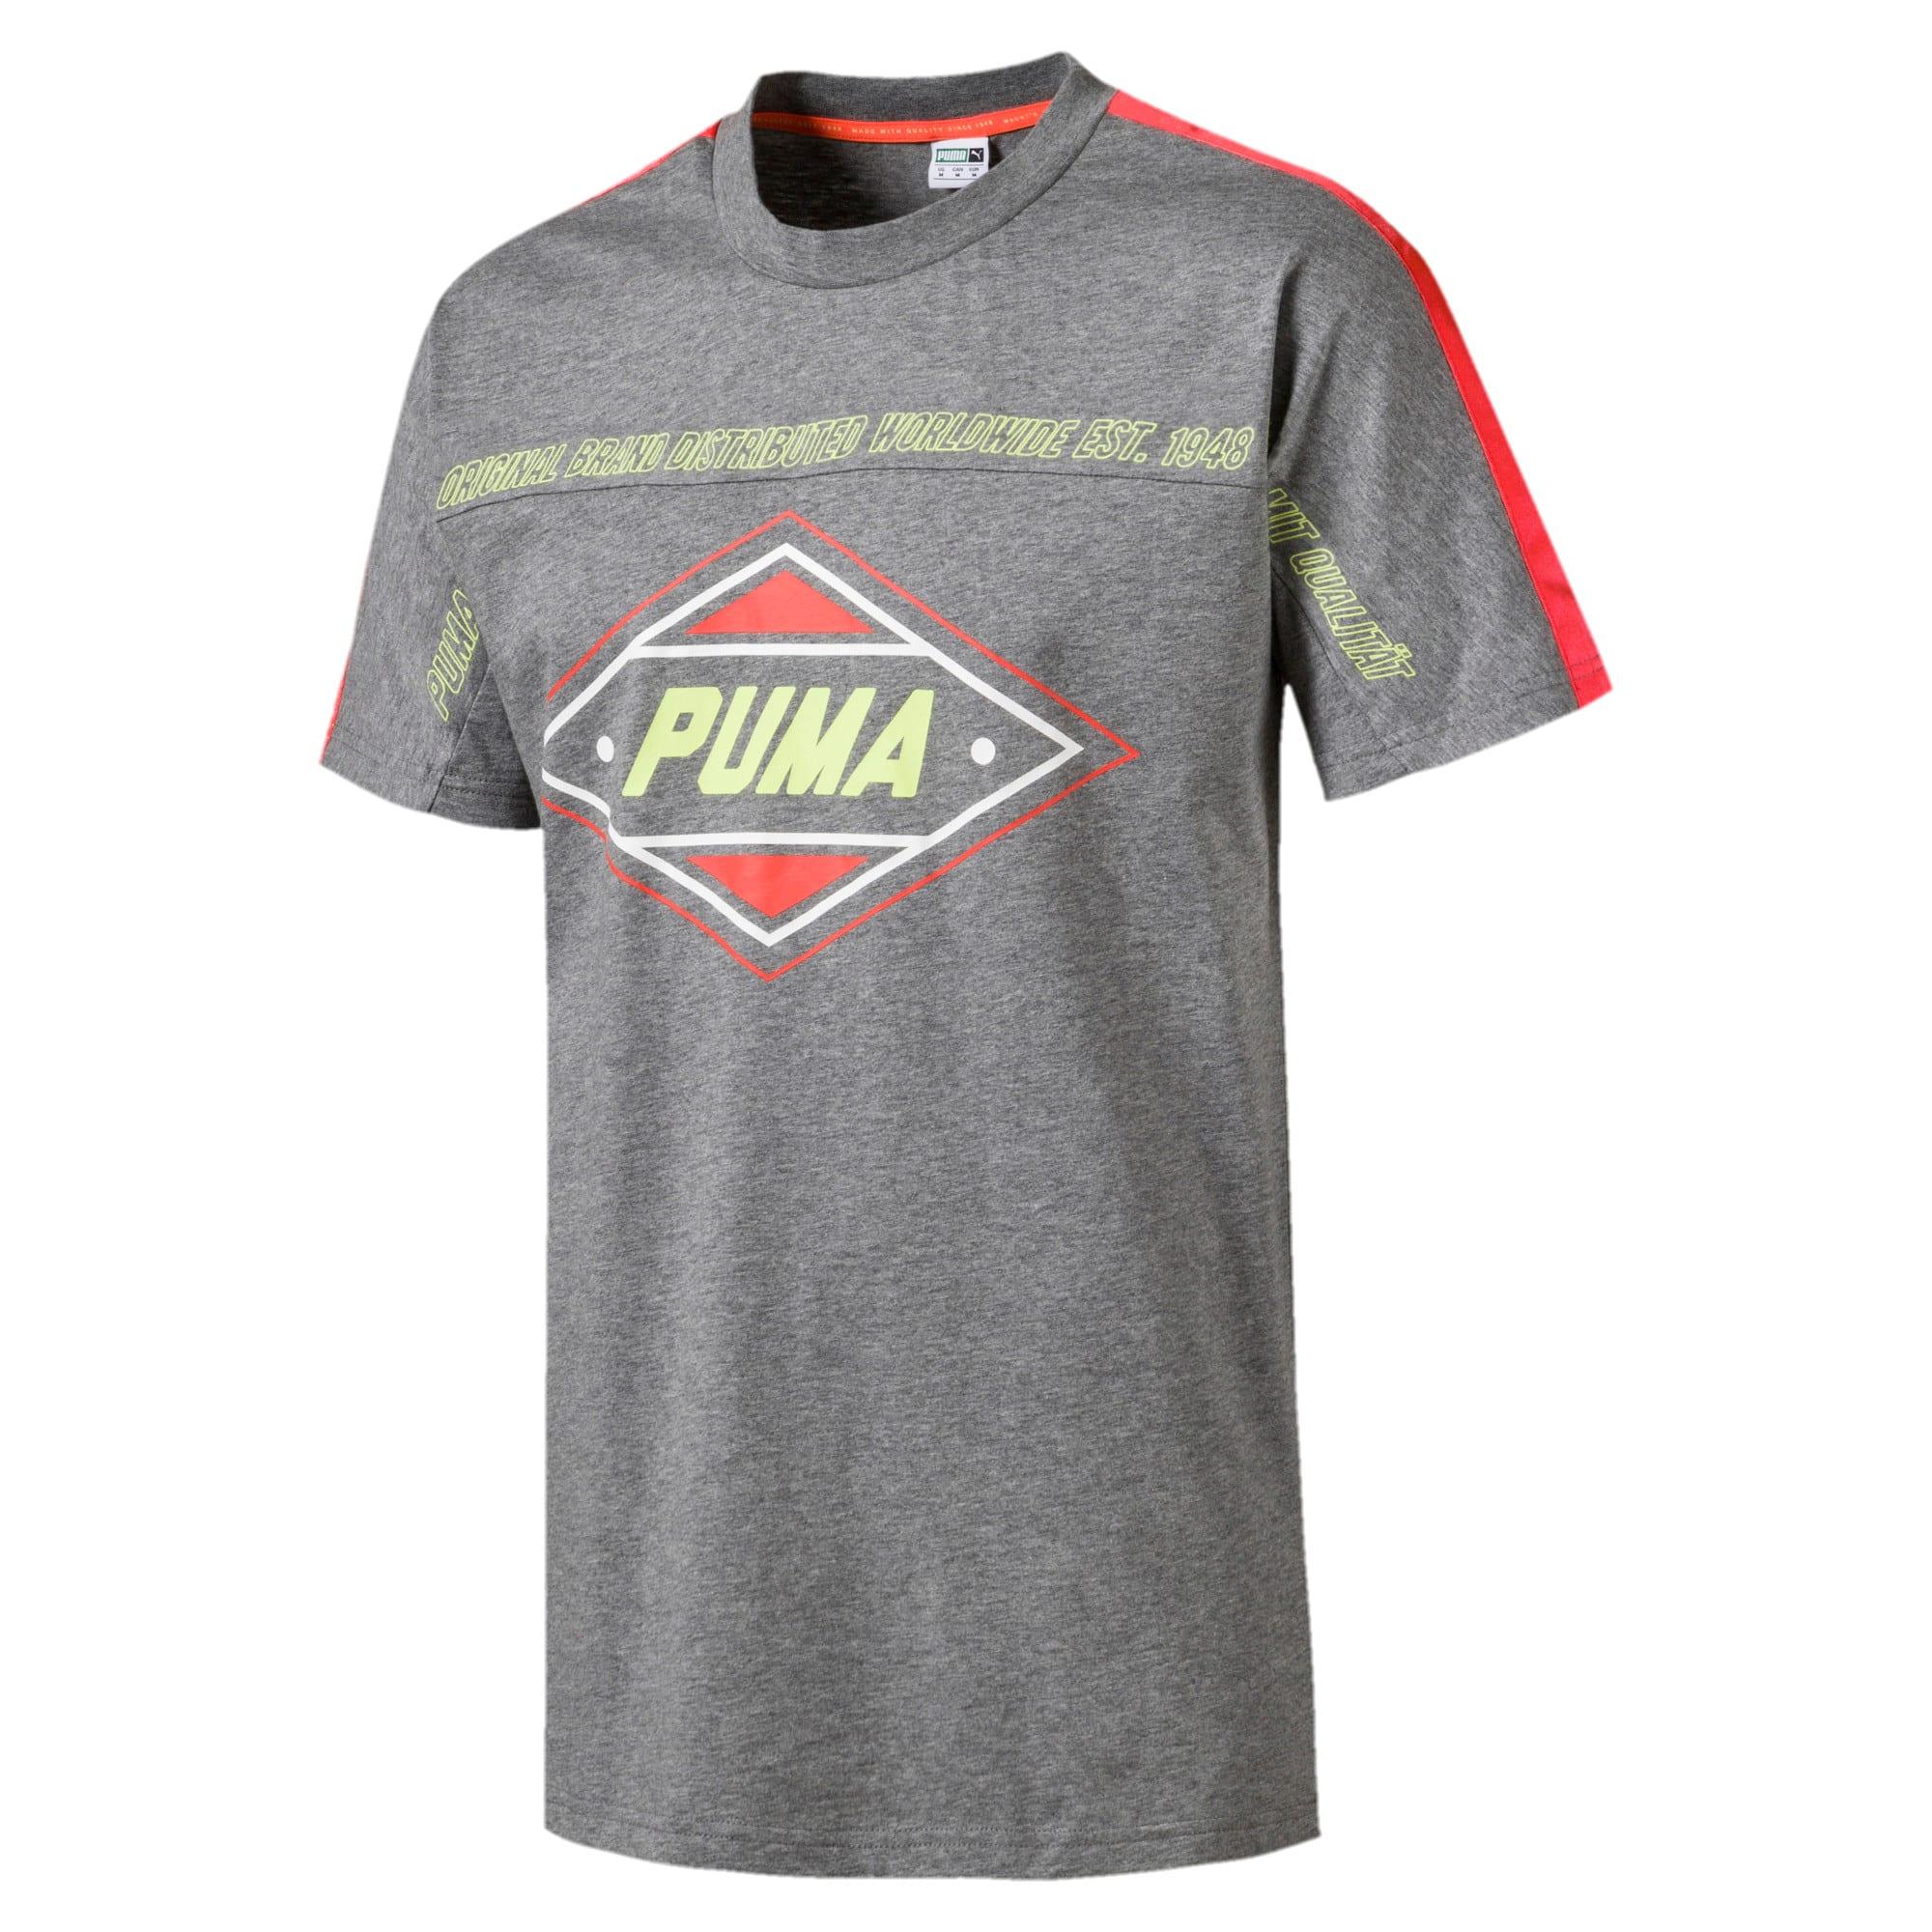 Miniatura 4 de Camiseta luXTG para hombre, Medium Gray Heather, mediano